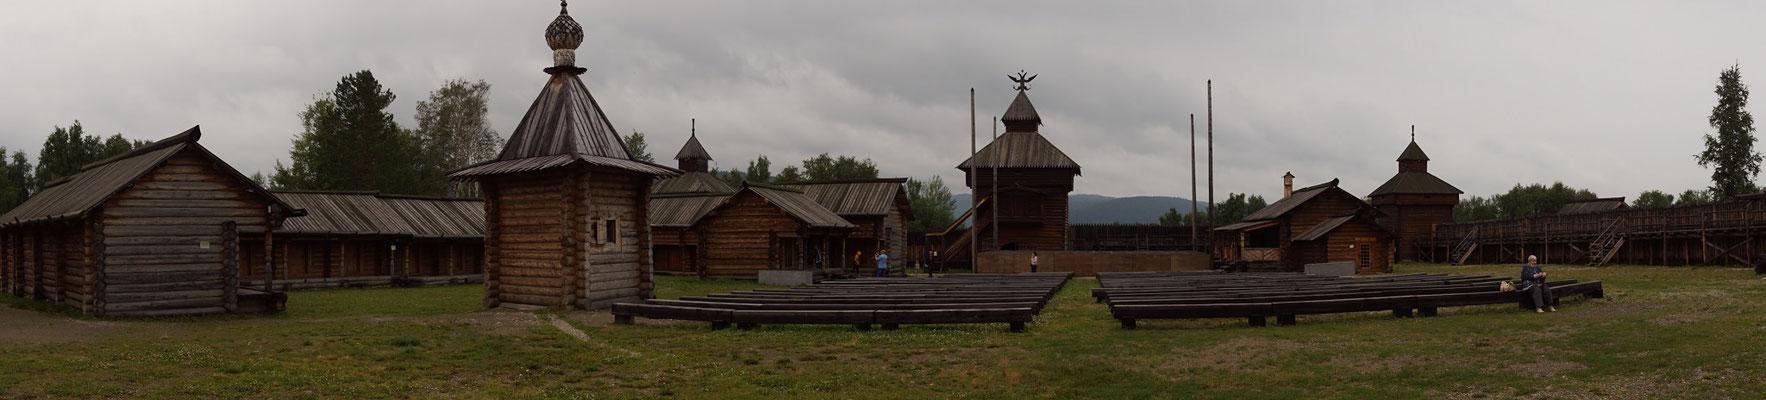 Holzfestung nachgebaut